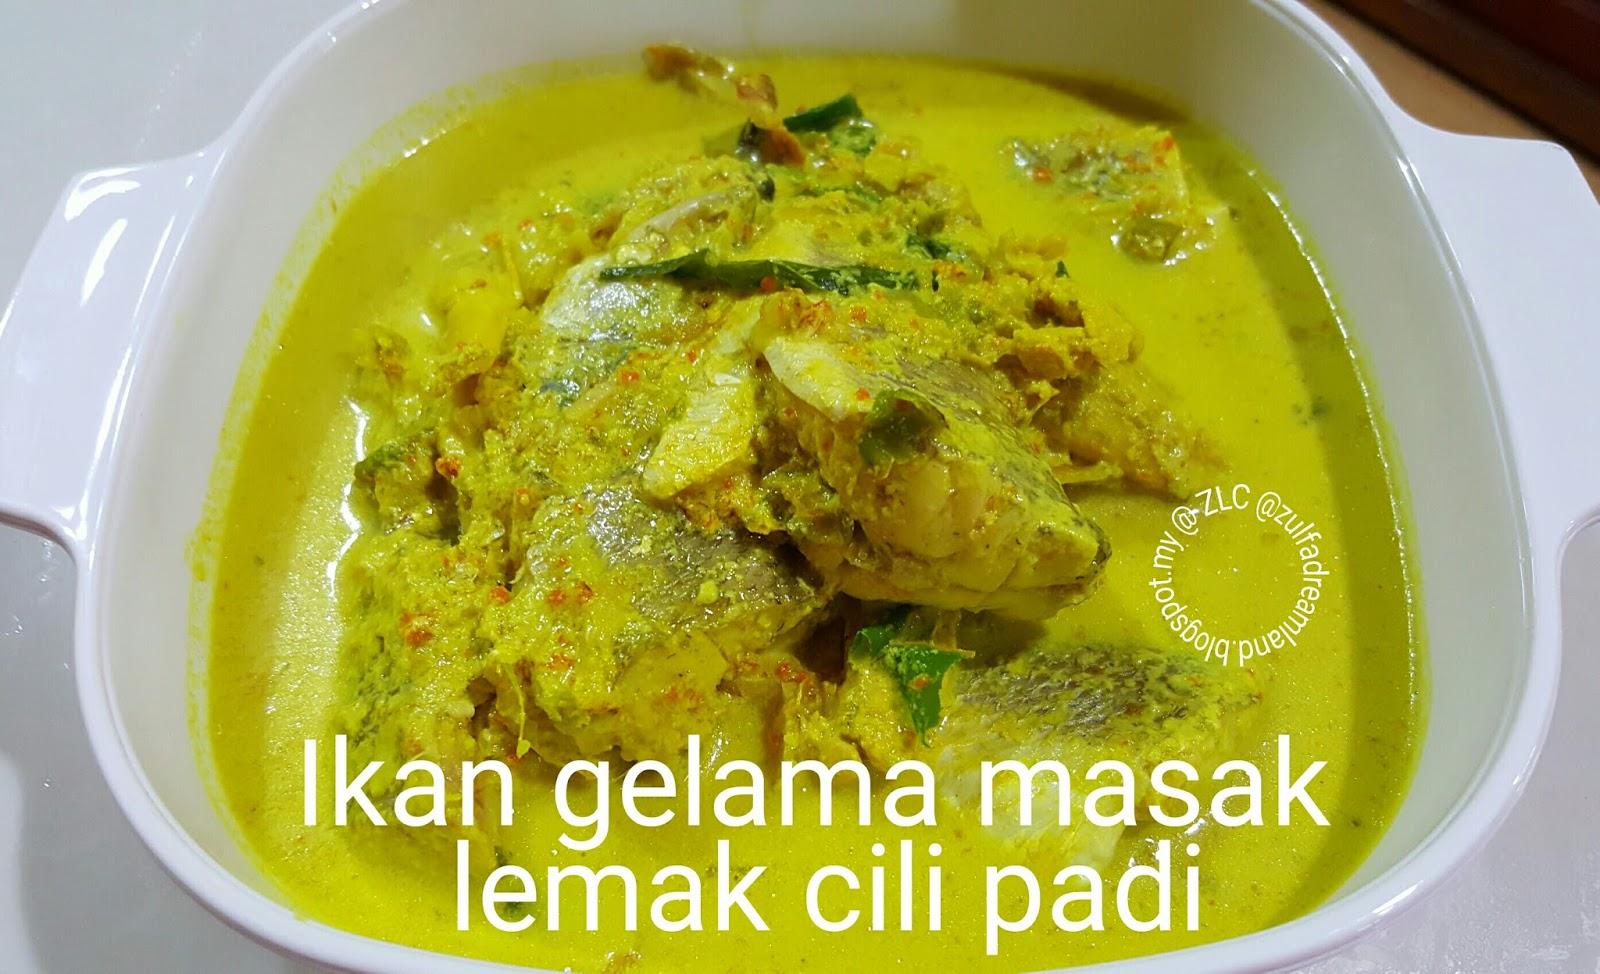 ZULFAZA LOVES COOKING: Ikan Gelama Masak Lemak Cili Padi